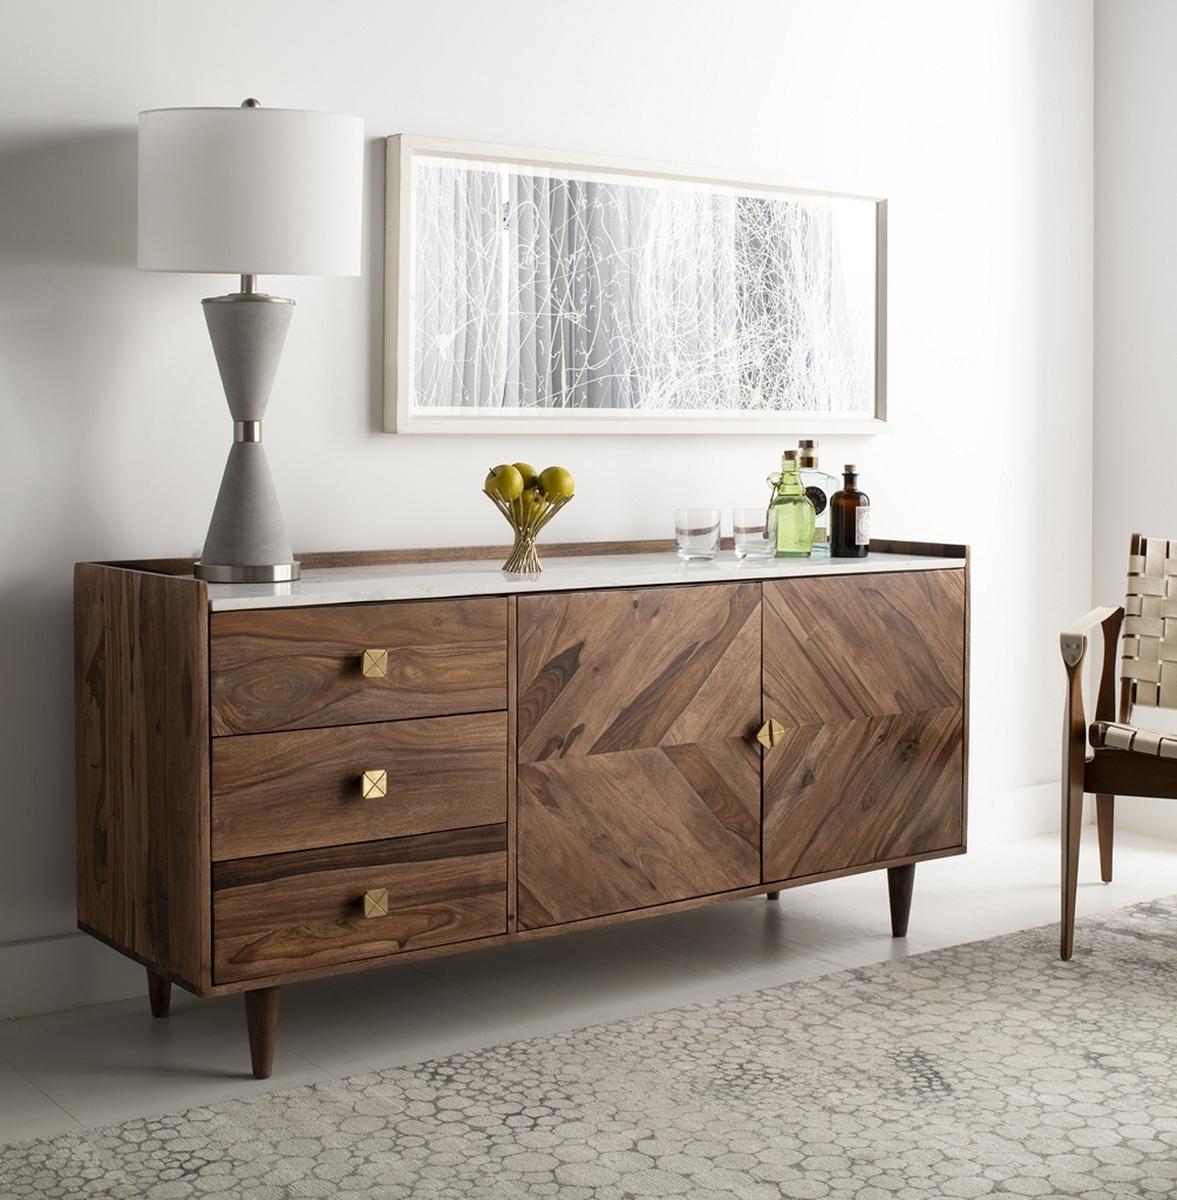 "Most Popular Cora Rose Herringbone Sideboard – Savvy Furniture With Regard To Herringbone 48"" Wide Buffet Tables (View 2 of 20)"